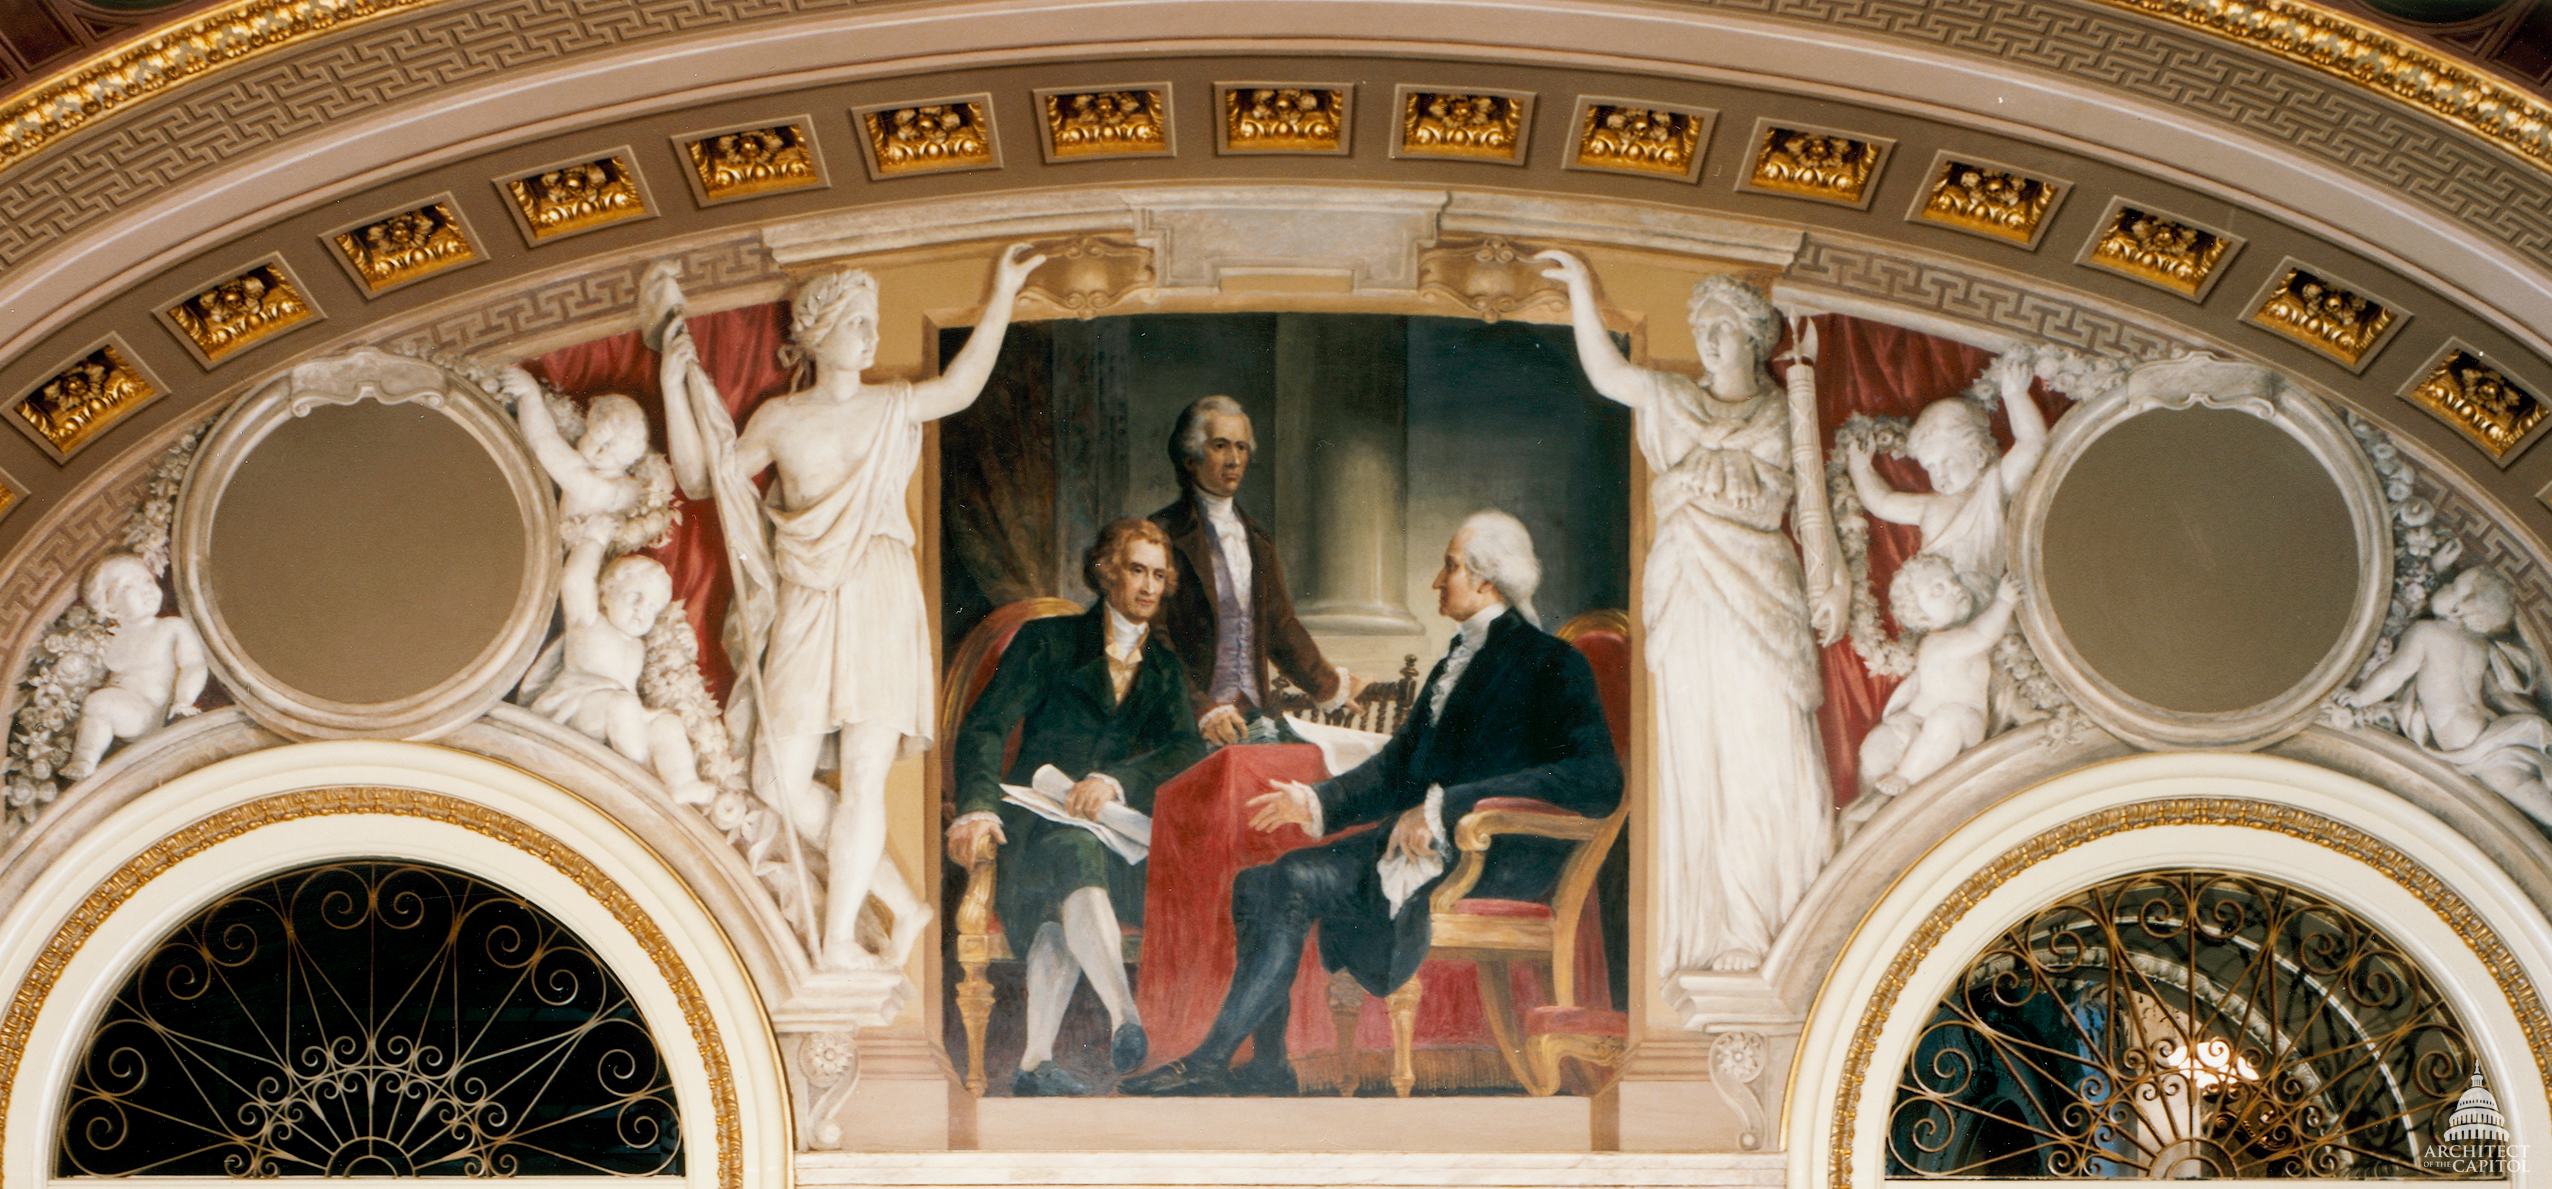 Comparison Of Thomas Jefferson And Alexander Hamilton